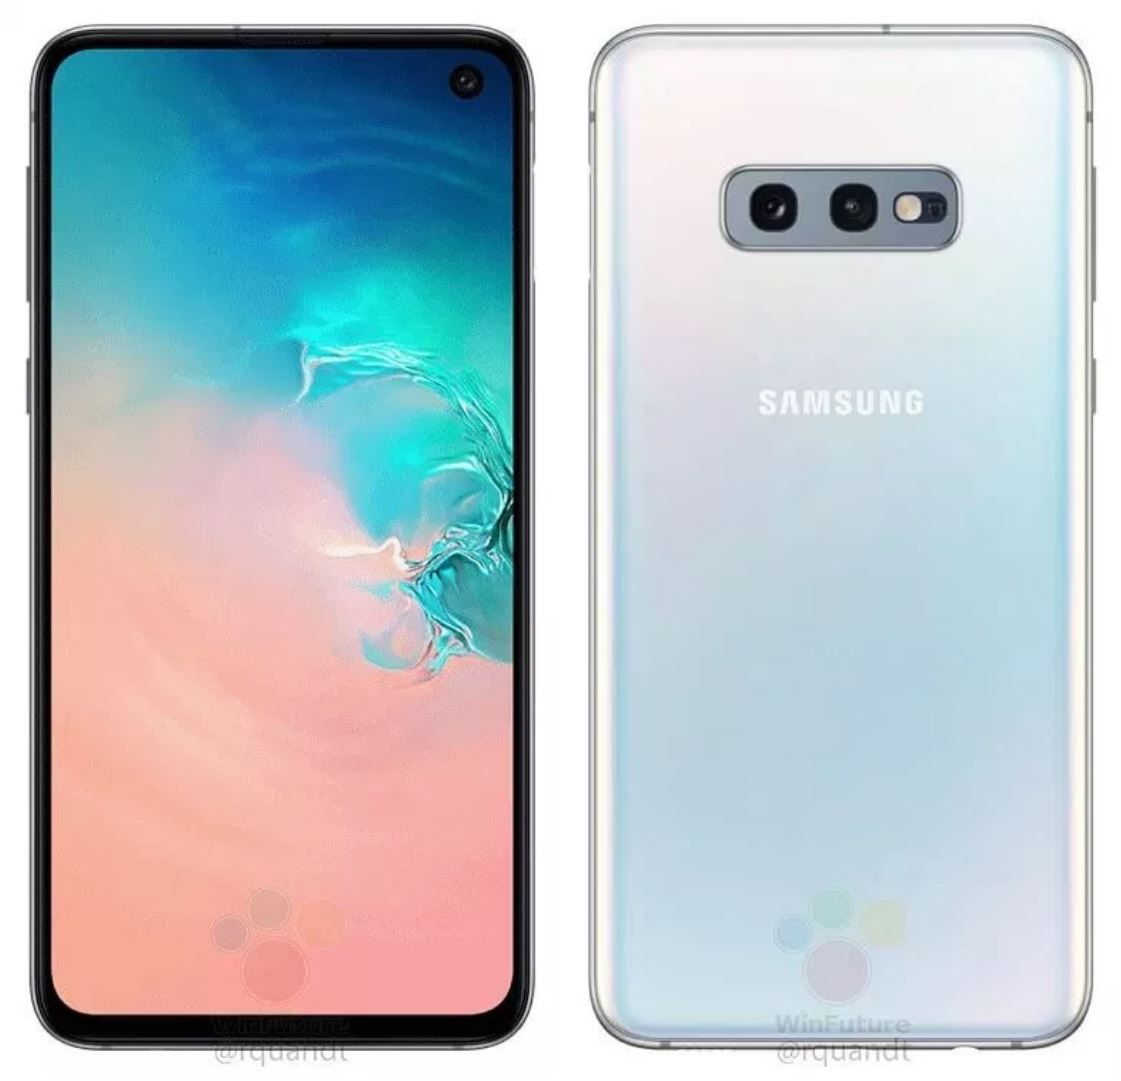 Samsung GALAXY S10 frate imagini